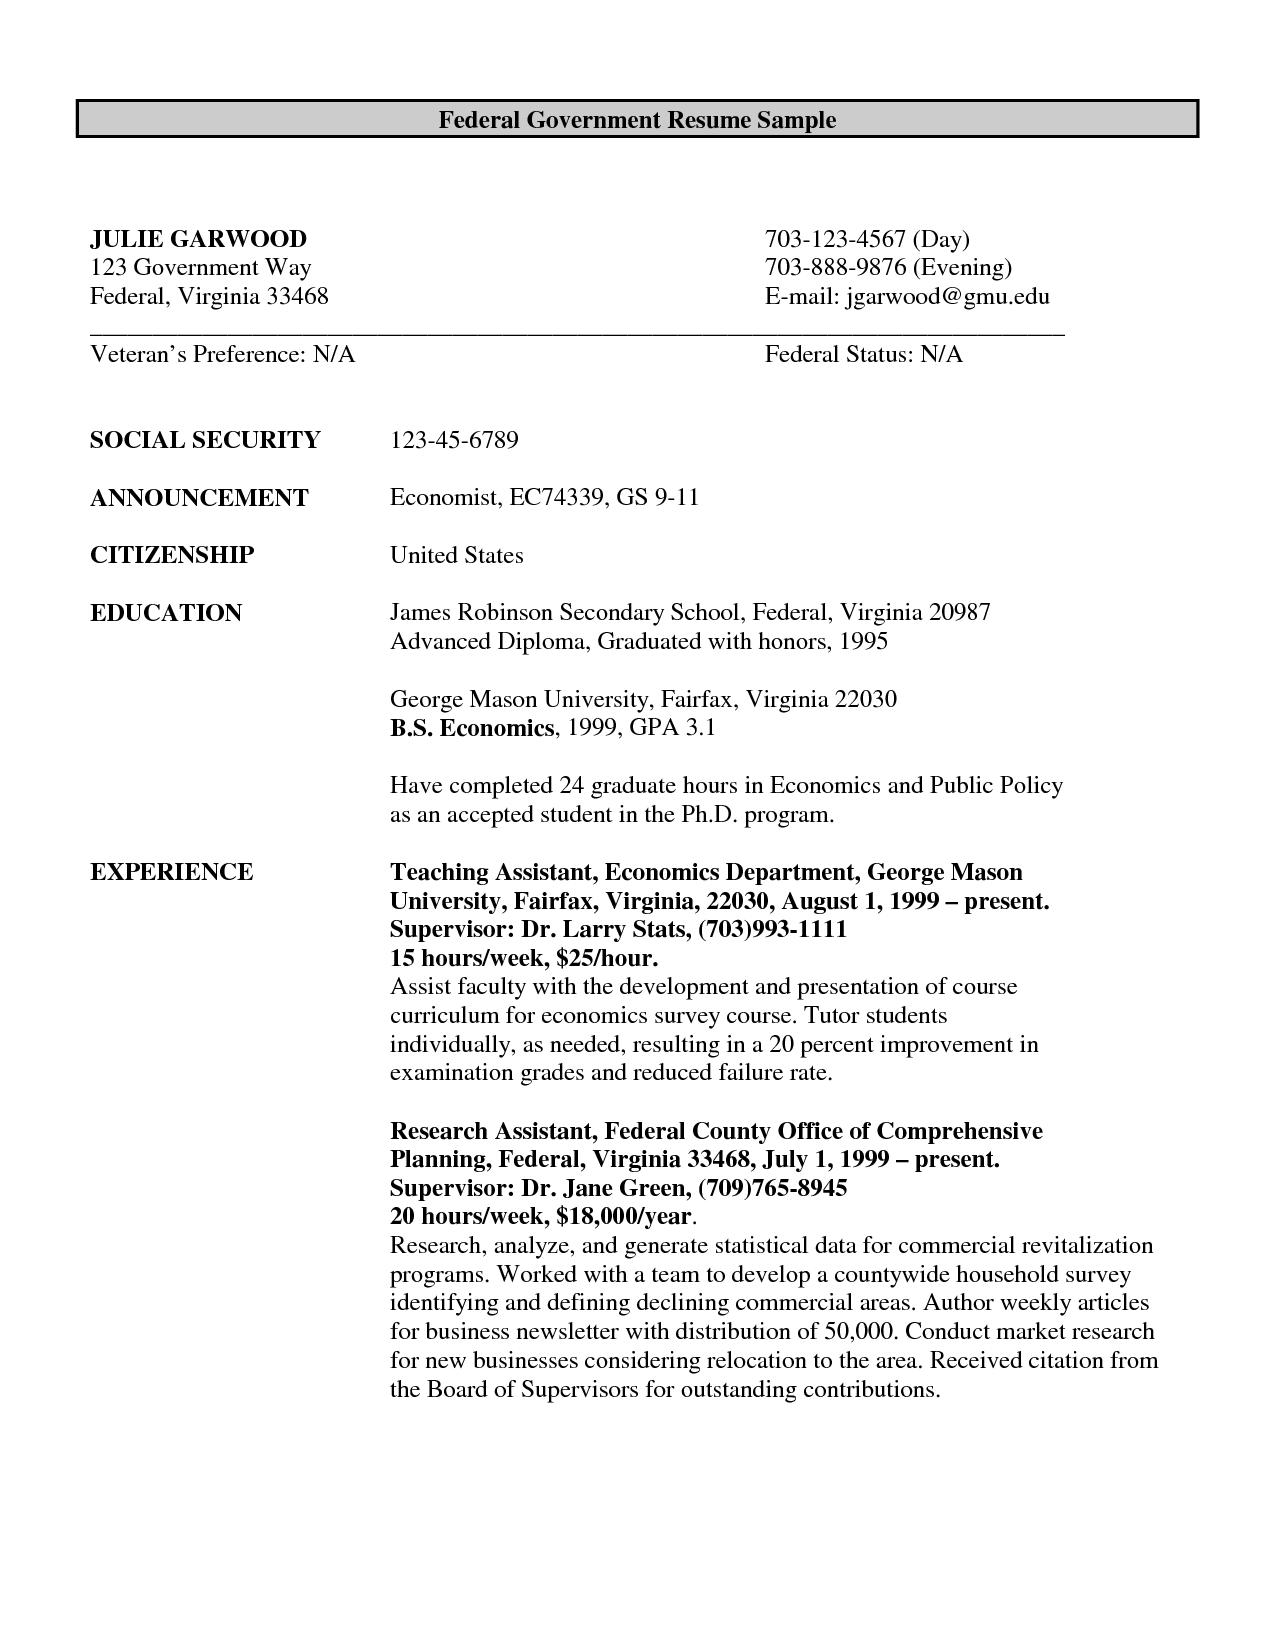 Government Job Federal resume, Job resume examples, Job